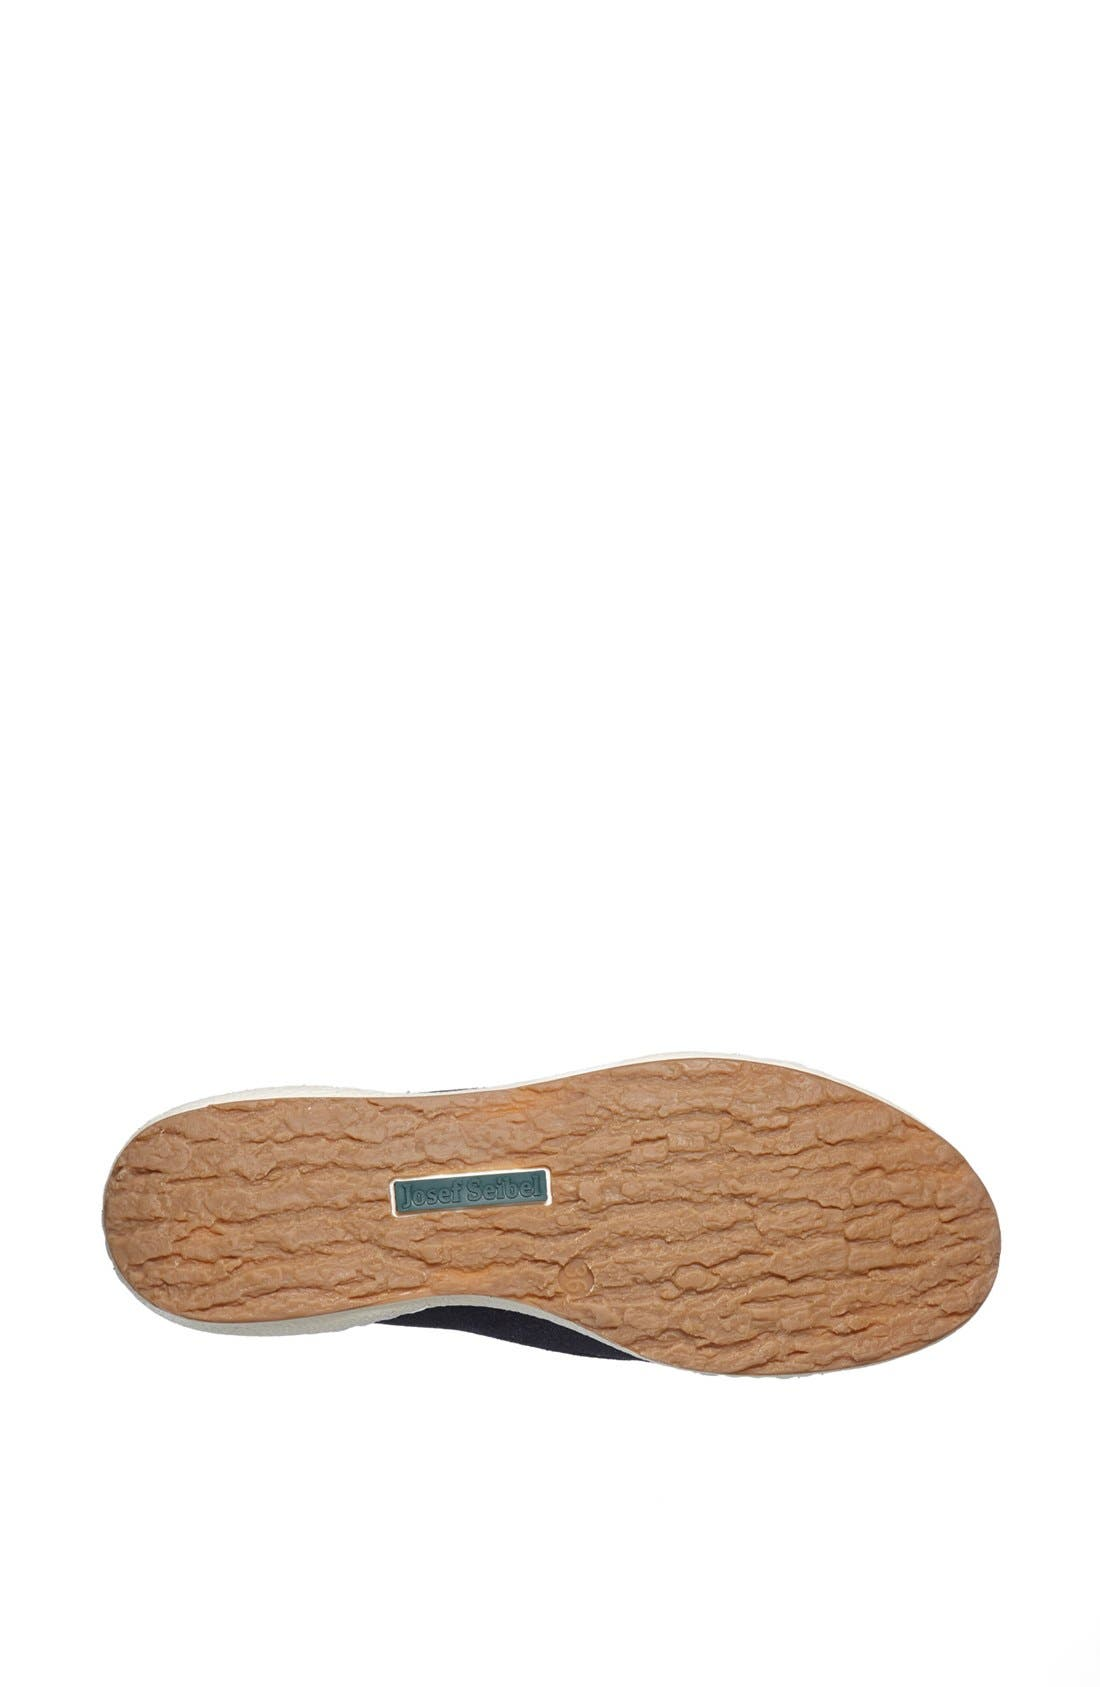 Alternate Image 4  - Josef Seibel 'Caspian 06' Leather Sneaker